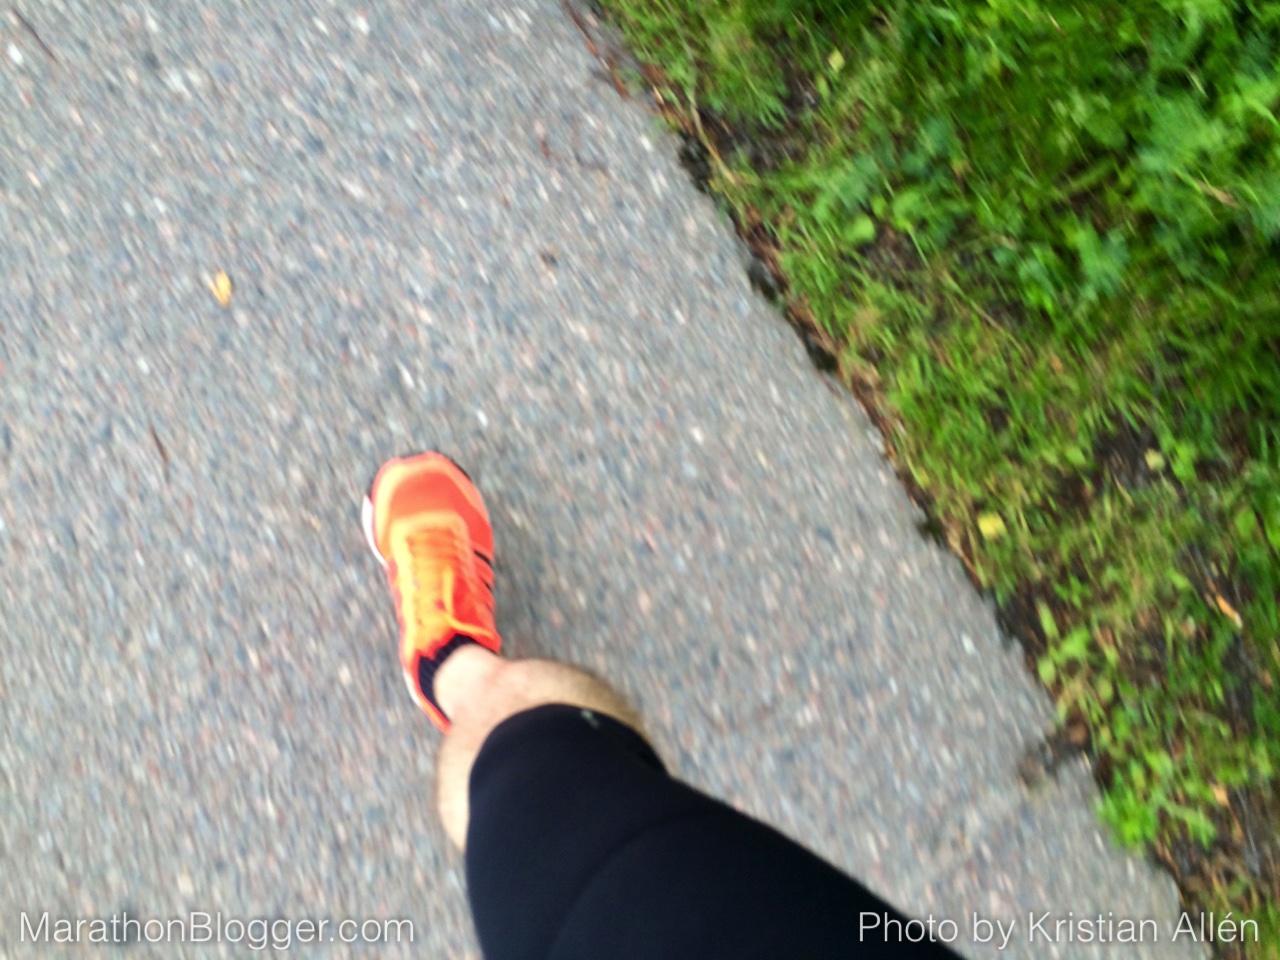 22.6.2015 10.02 km Run